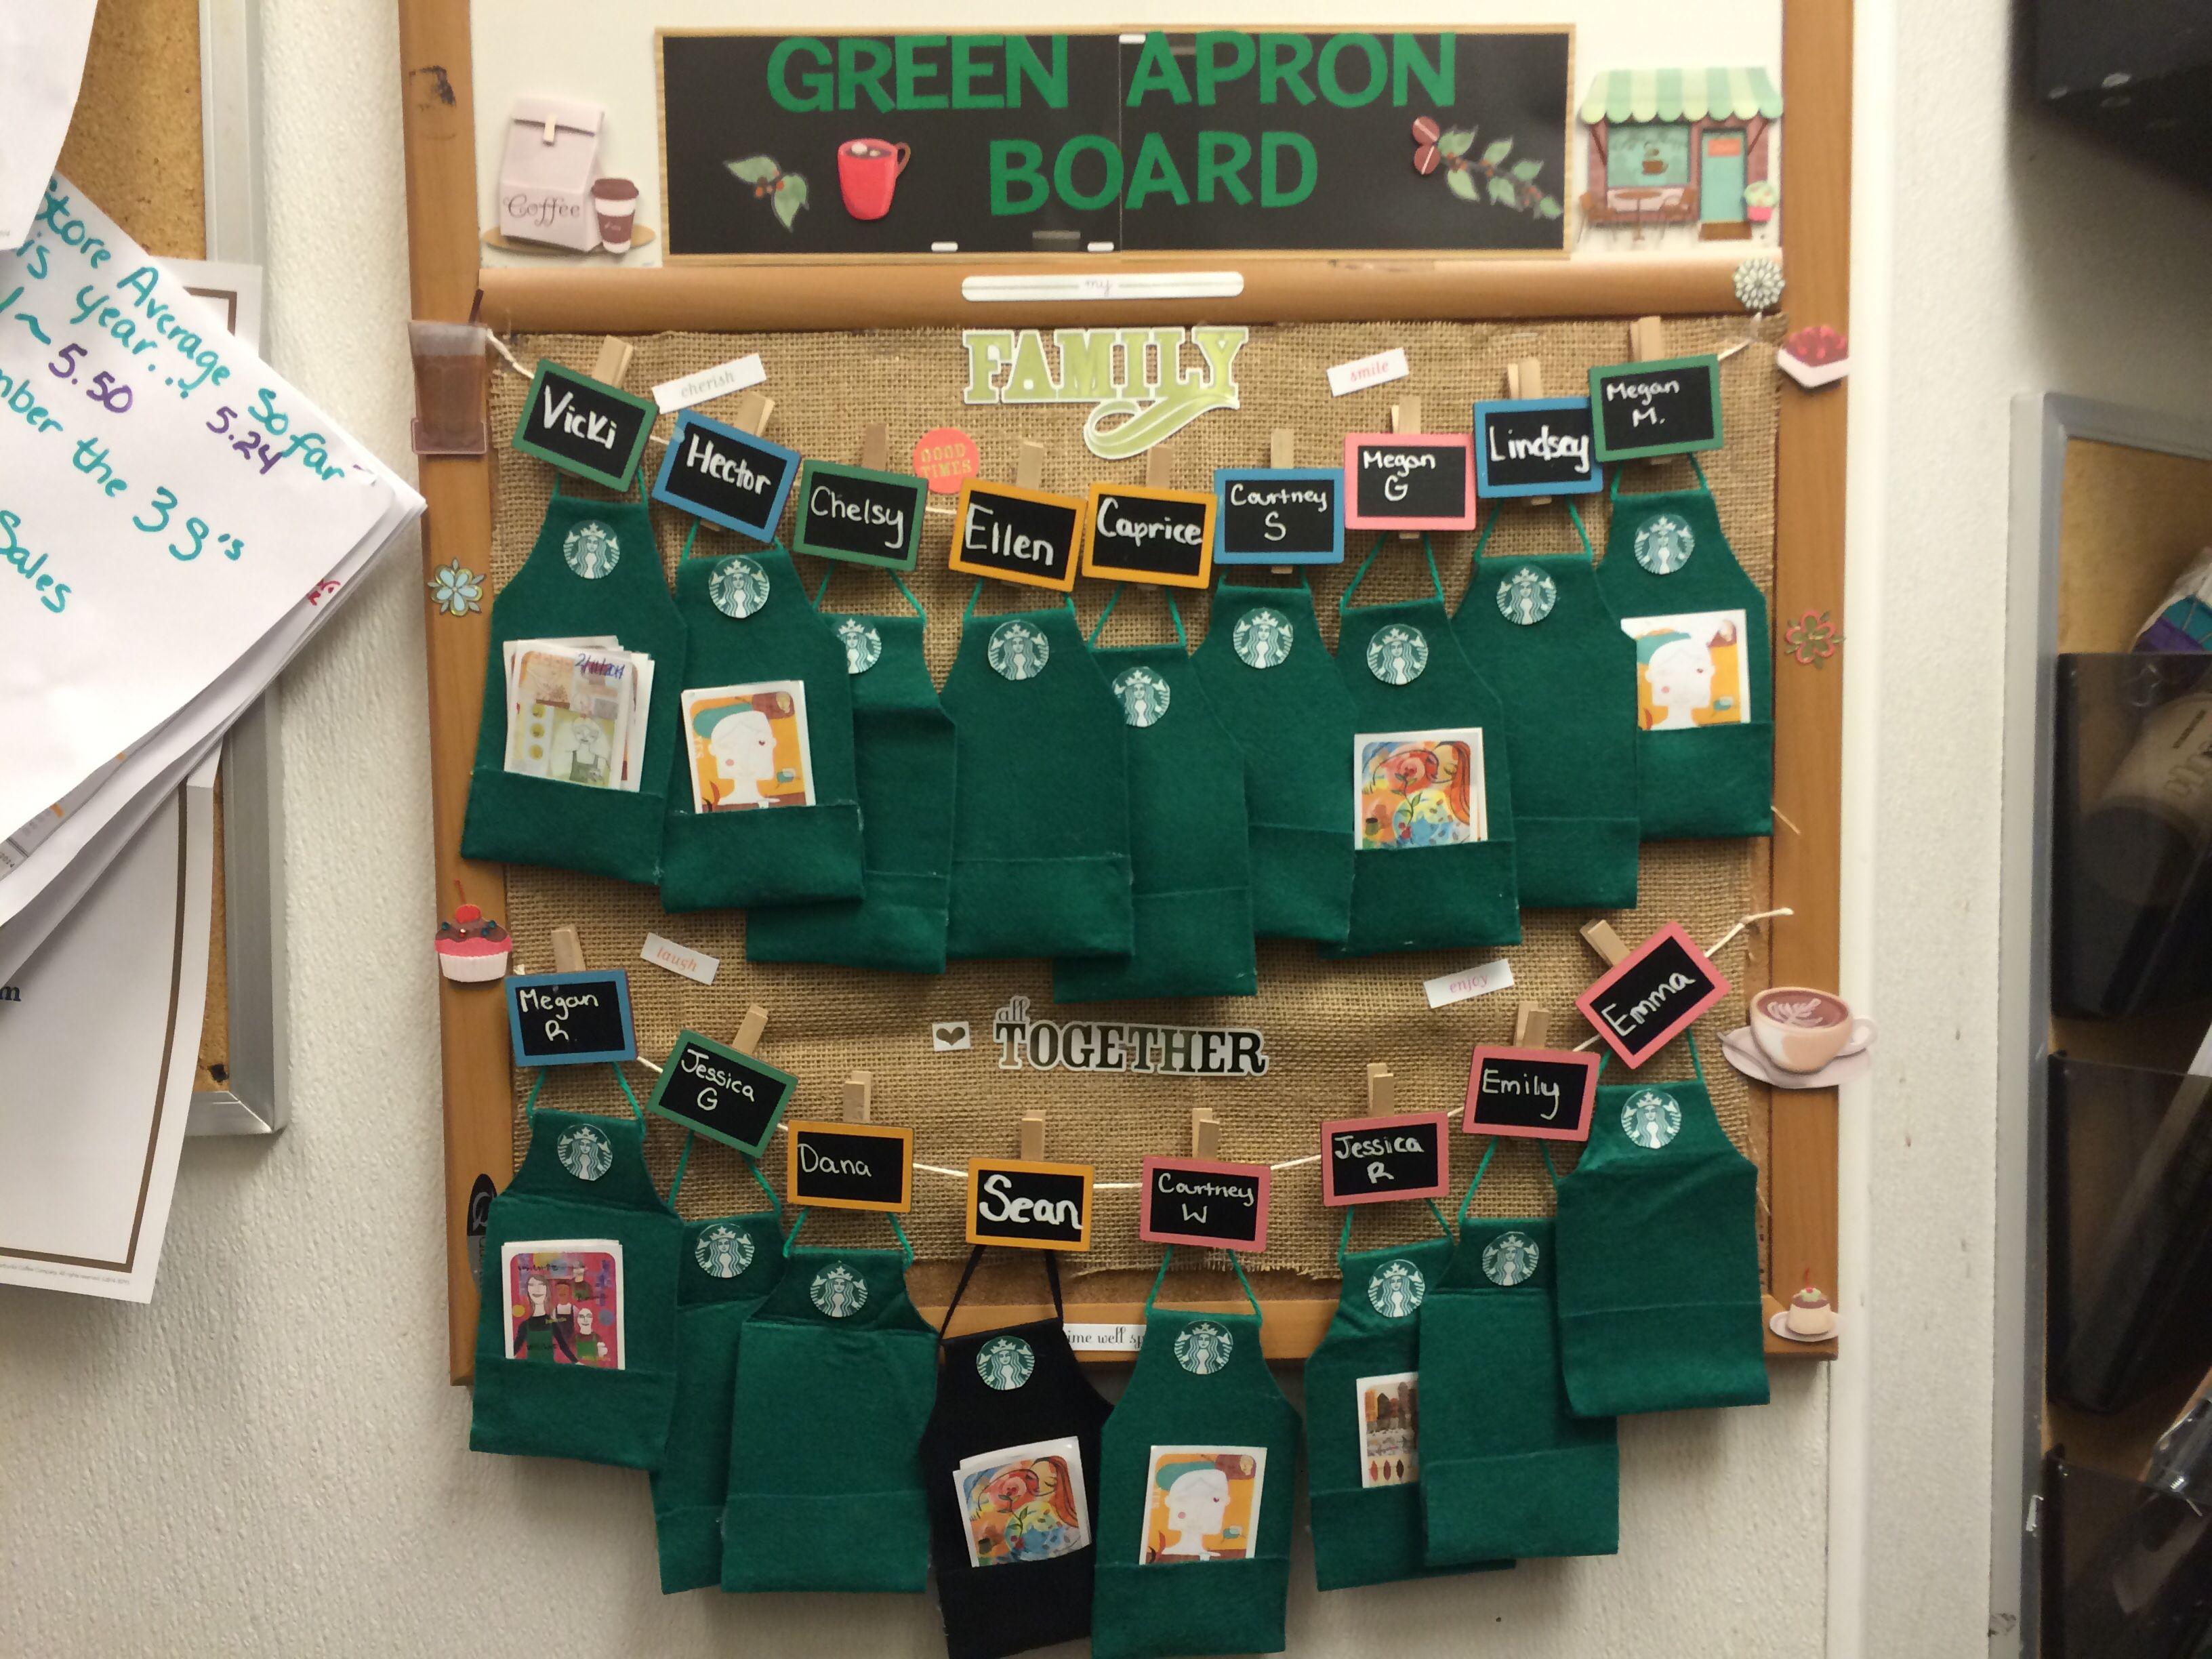 Blue apron hq - Green Apron Board I Made For My Sonoma Starbucks